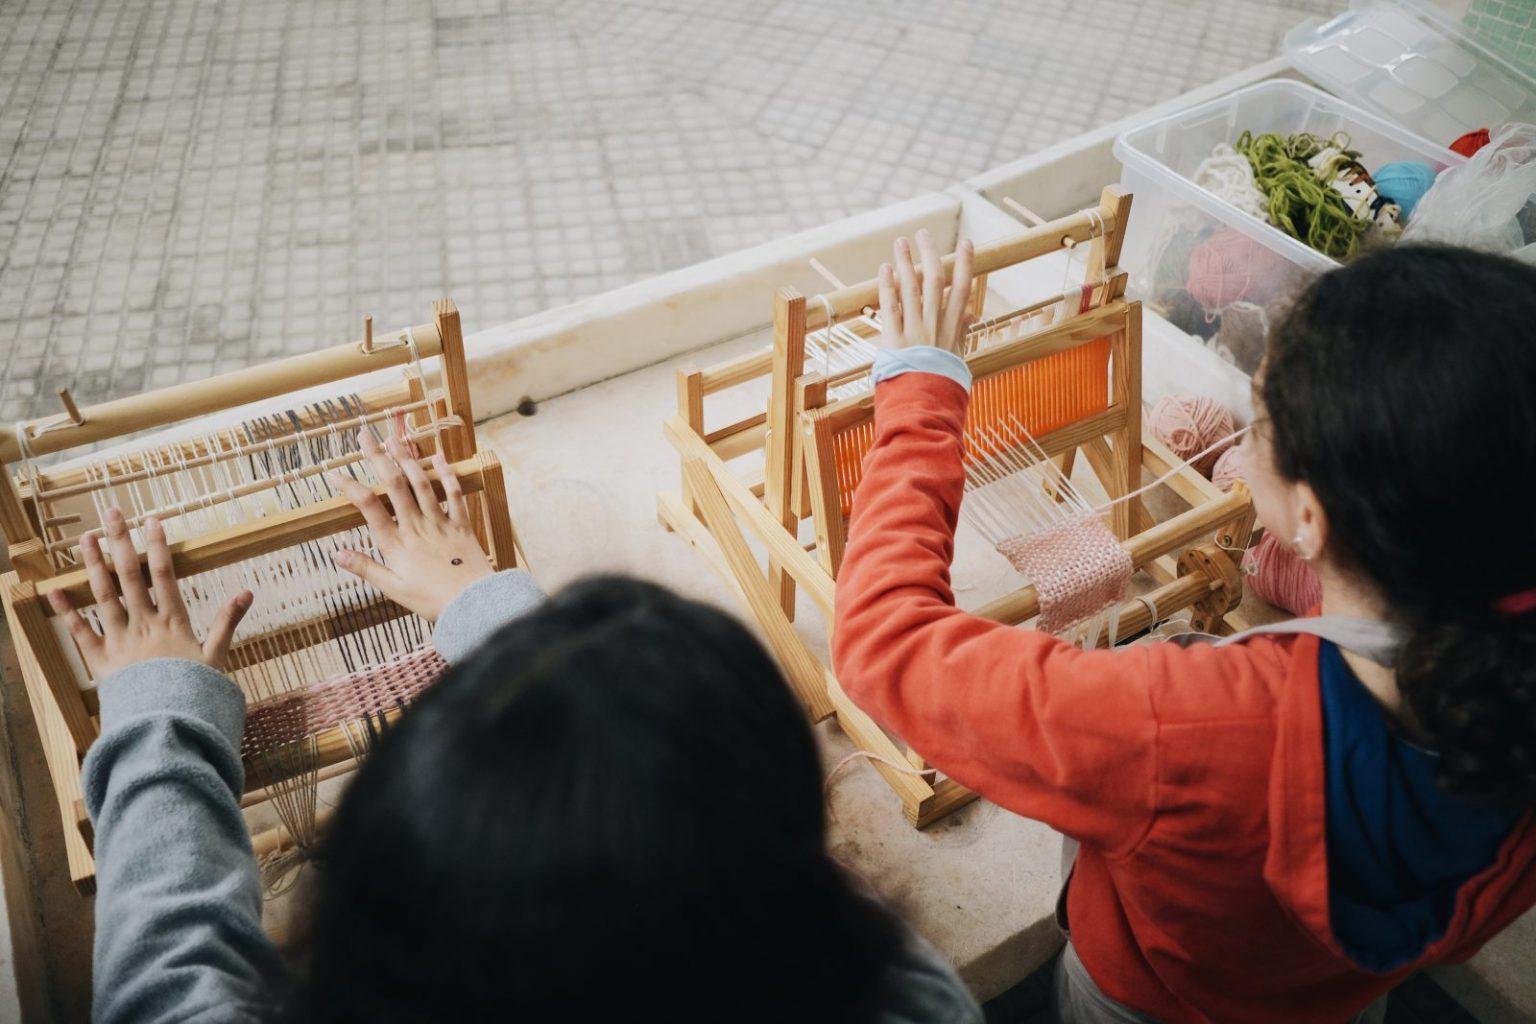 Mercado-das-Torcatas-Workshop